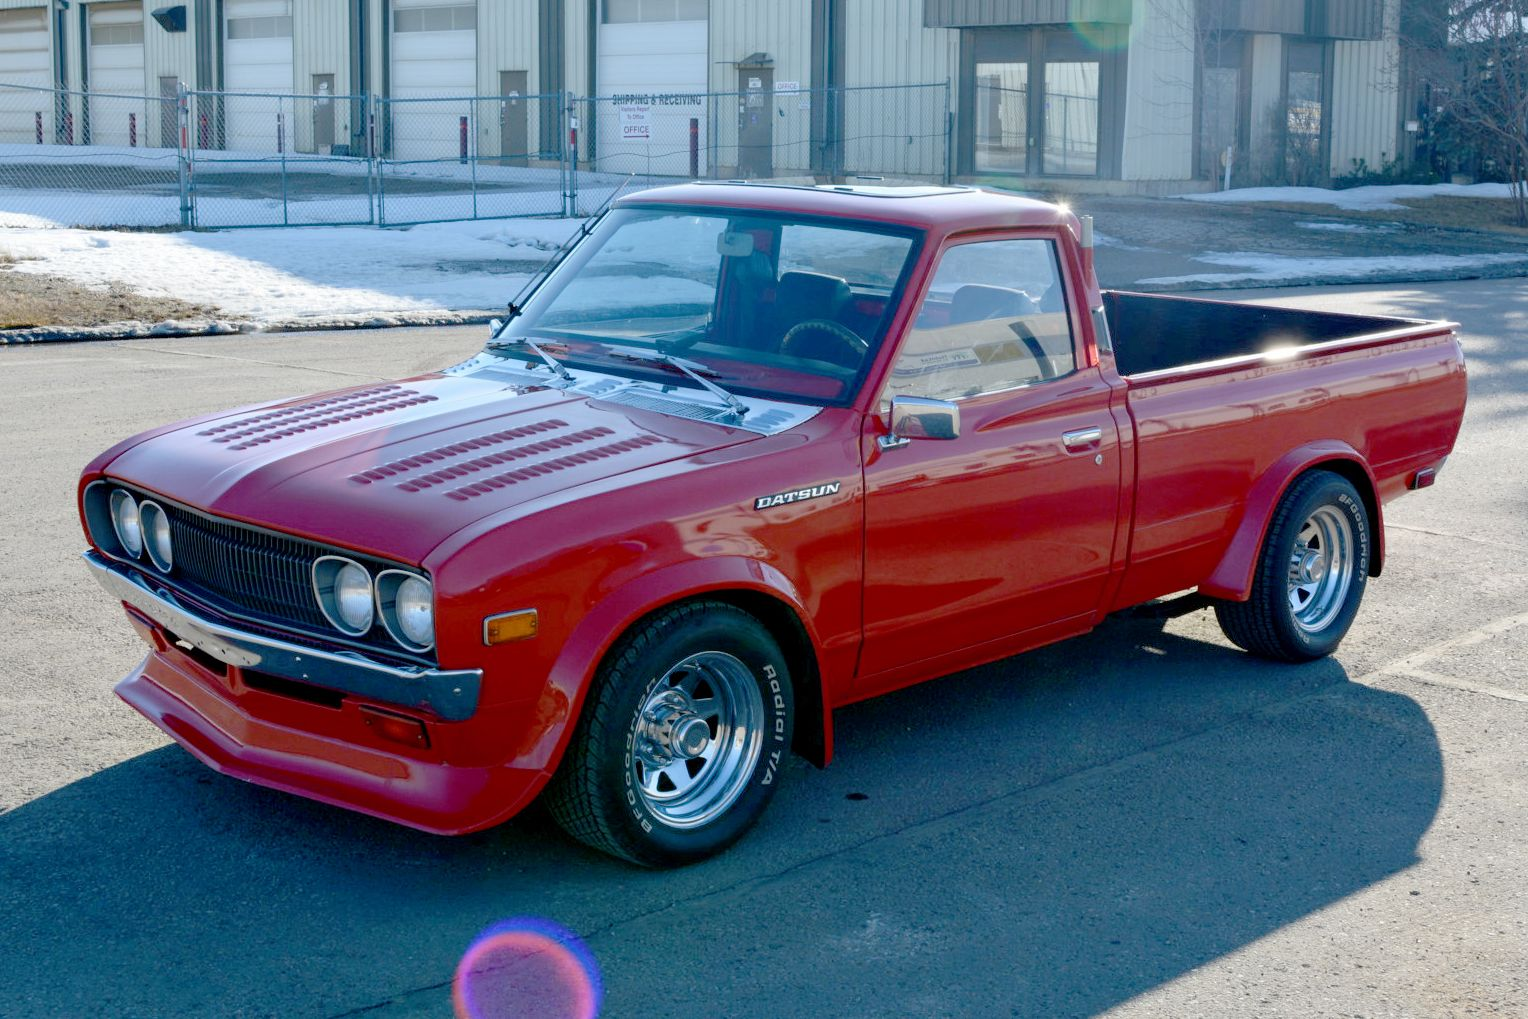 1974 Datsun 620 Pickup Datsun Pickup Datsun Pickup Car